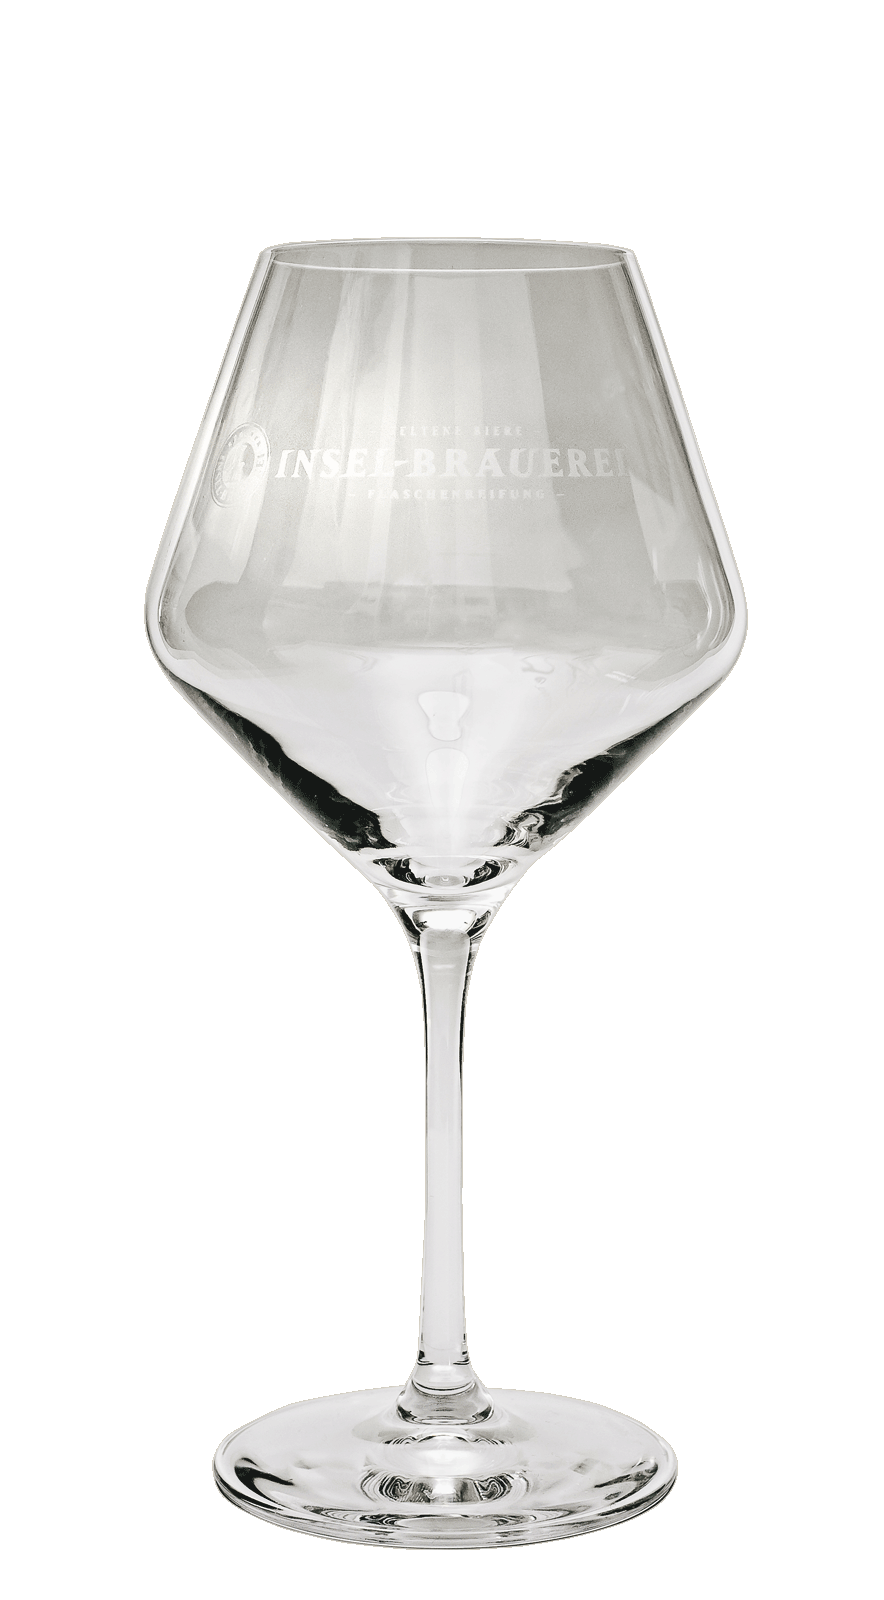 Gourmetglas - Logo Insel-Brauerei